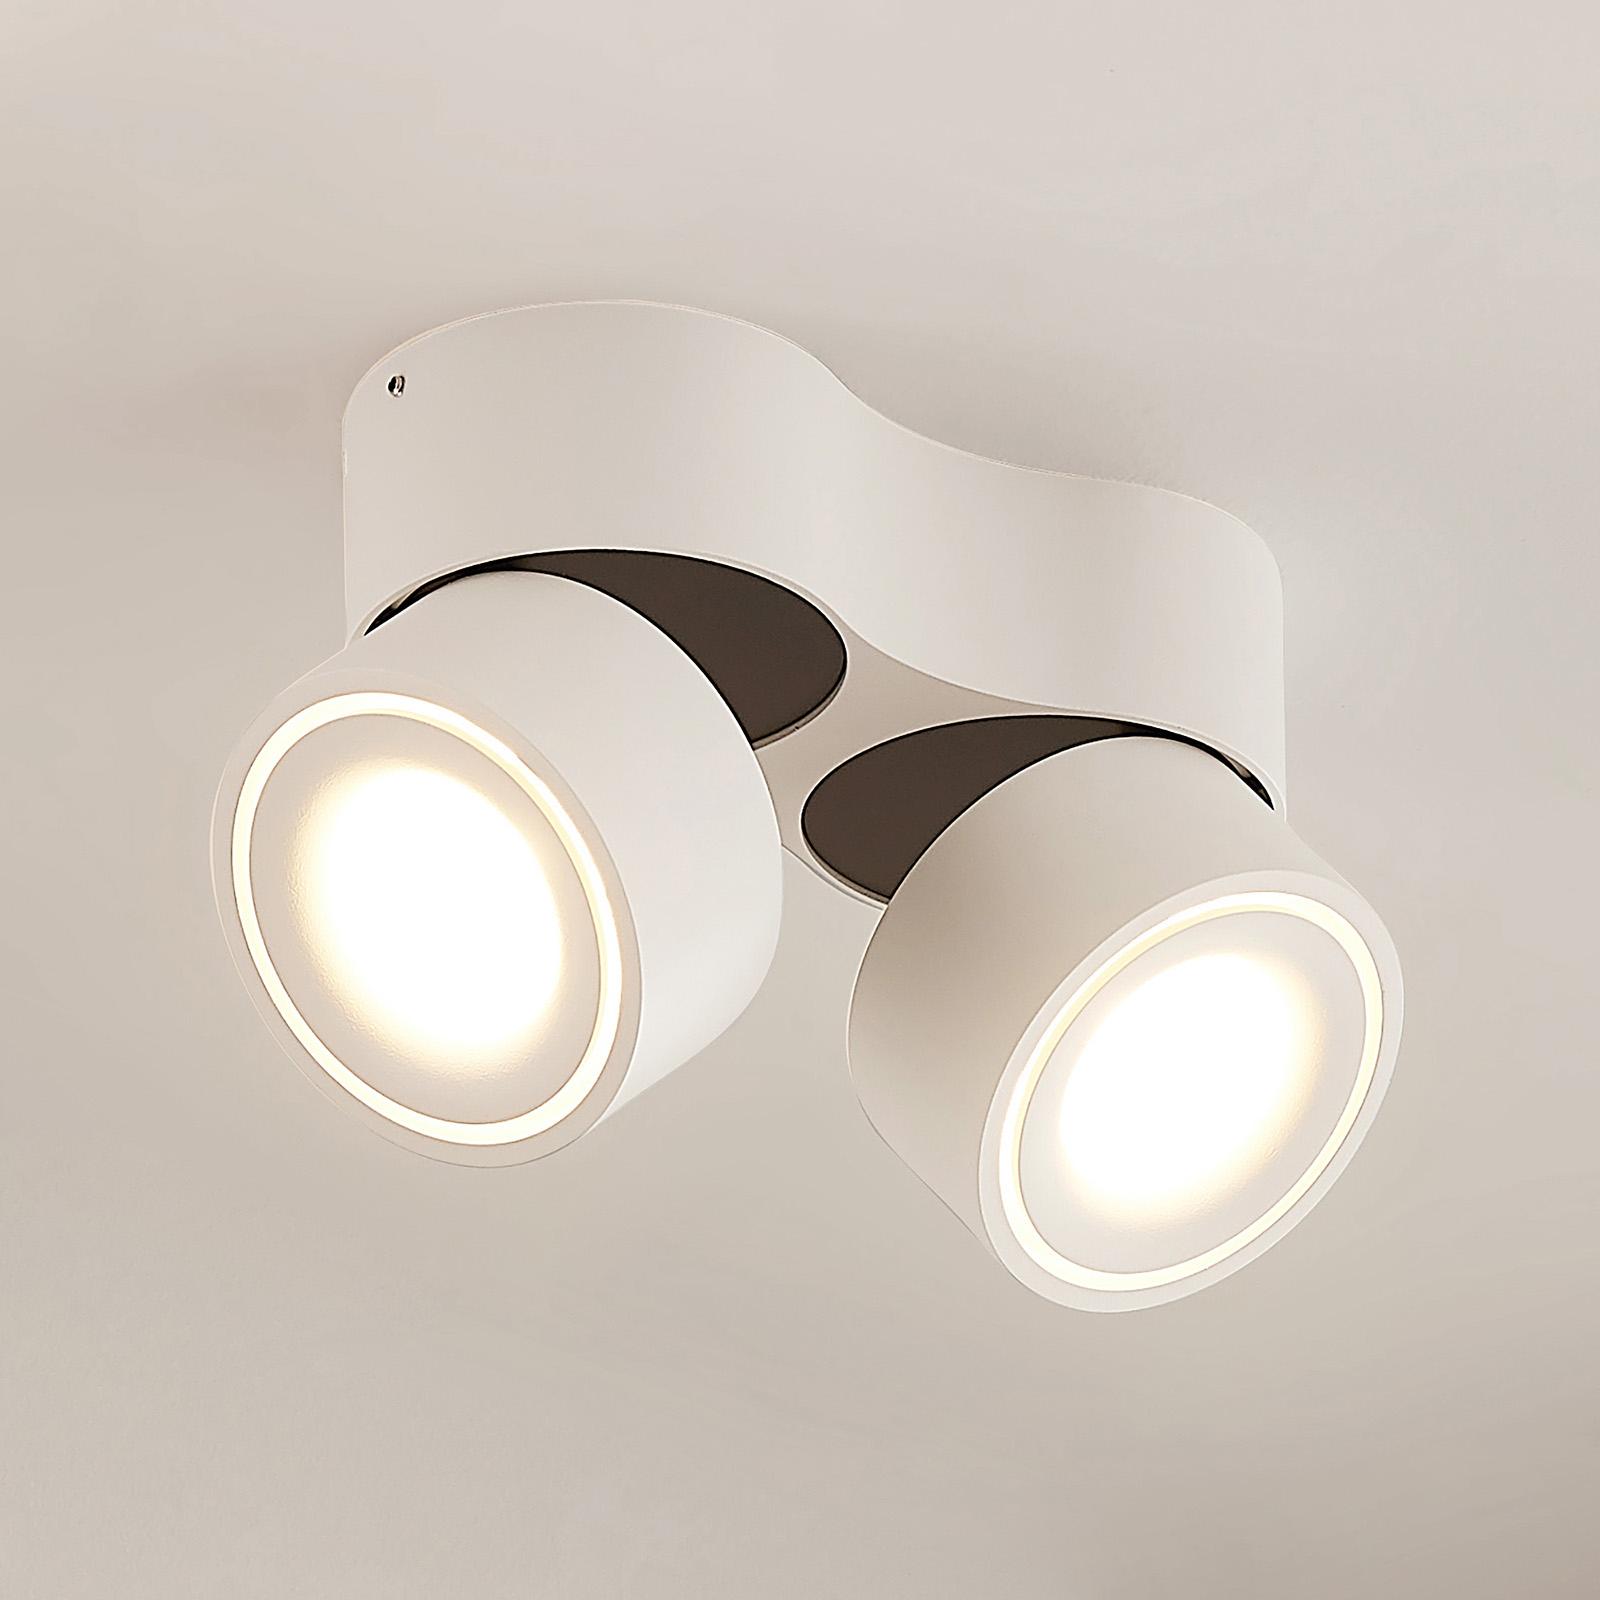 Arcchio Rotari LED-Deckenstrahler 2-flammig 2x8,9W